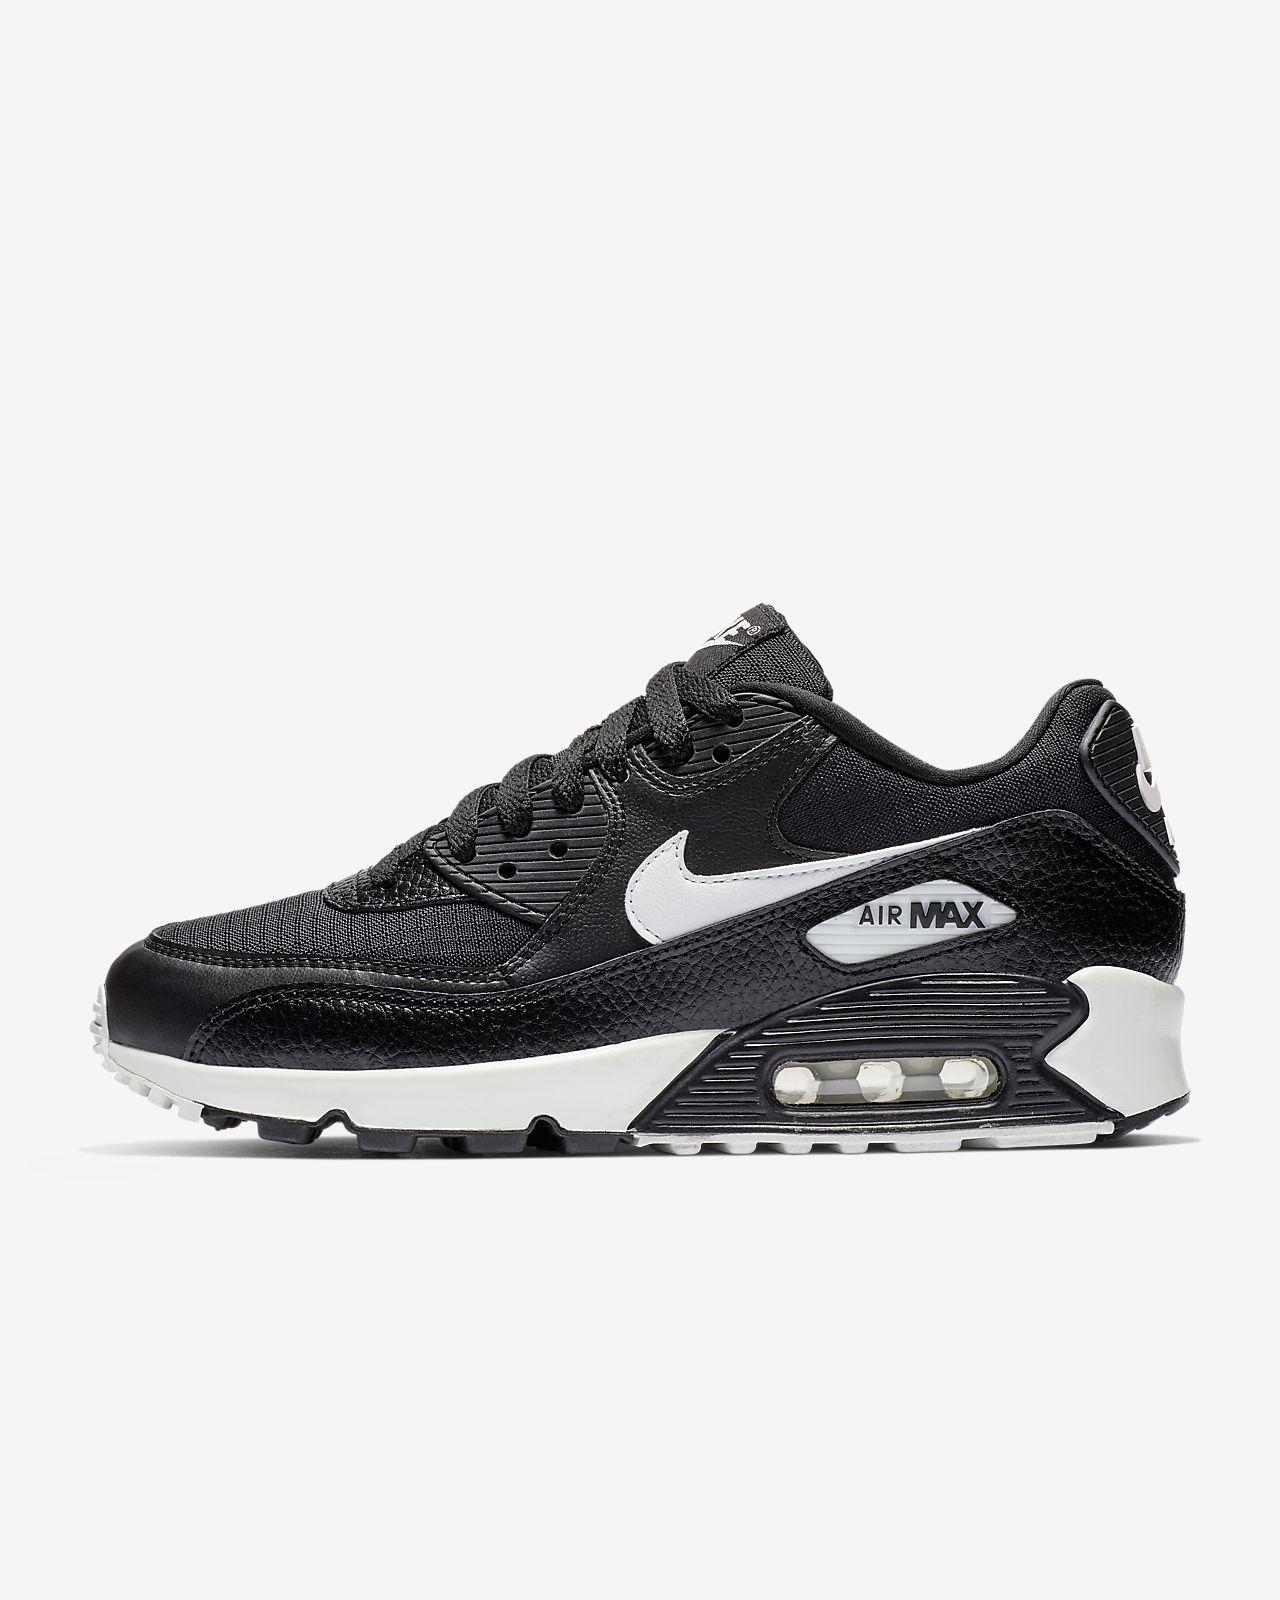 sports shoes 68e94 1cb41 ... Calzado para mujer Nike Air Max 90